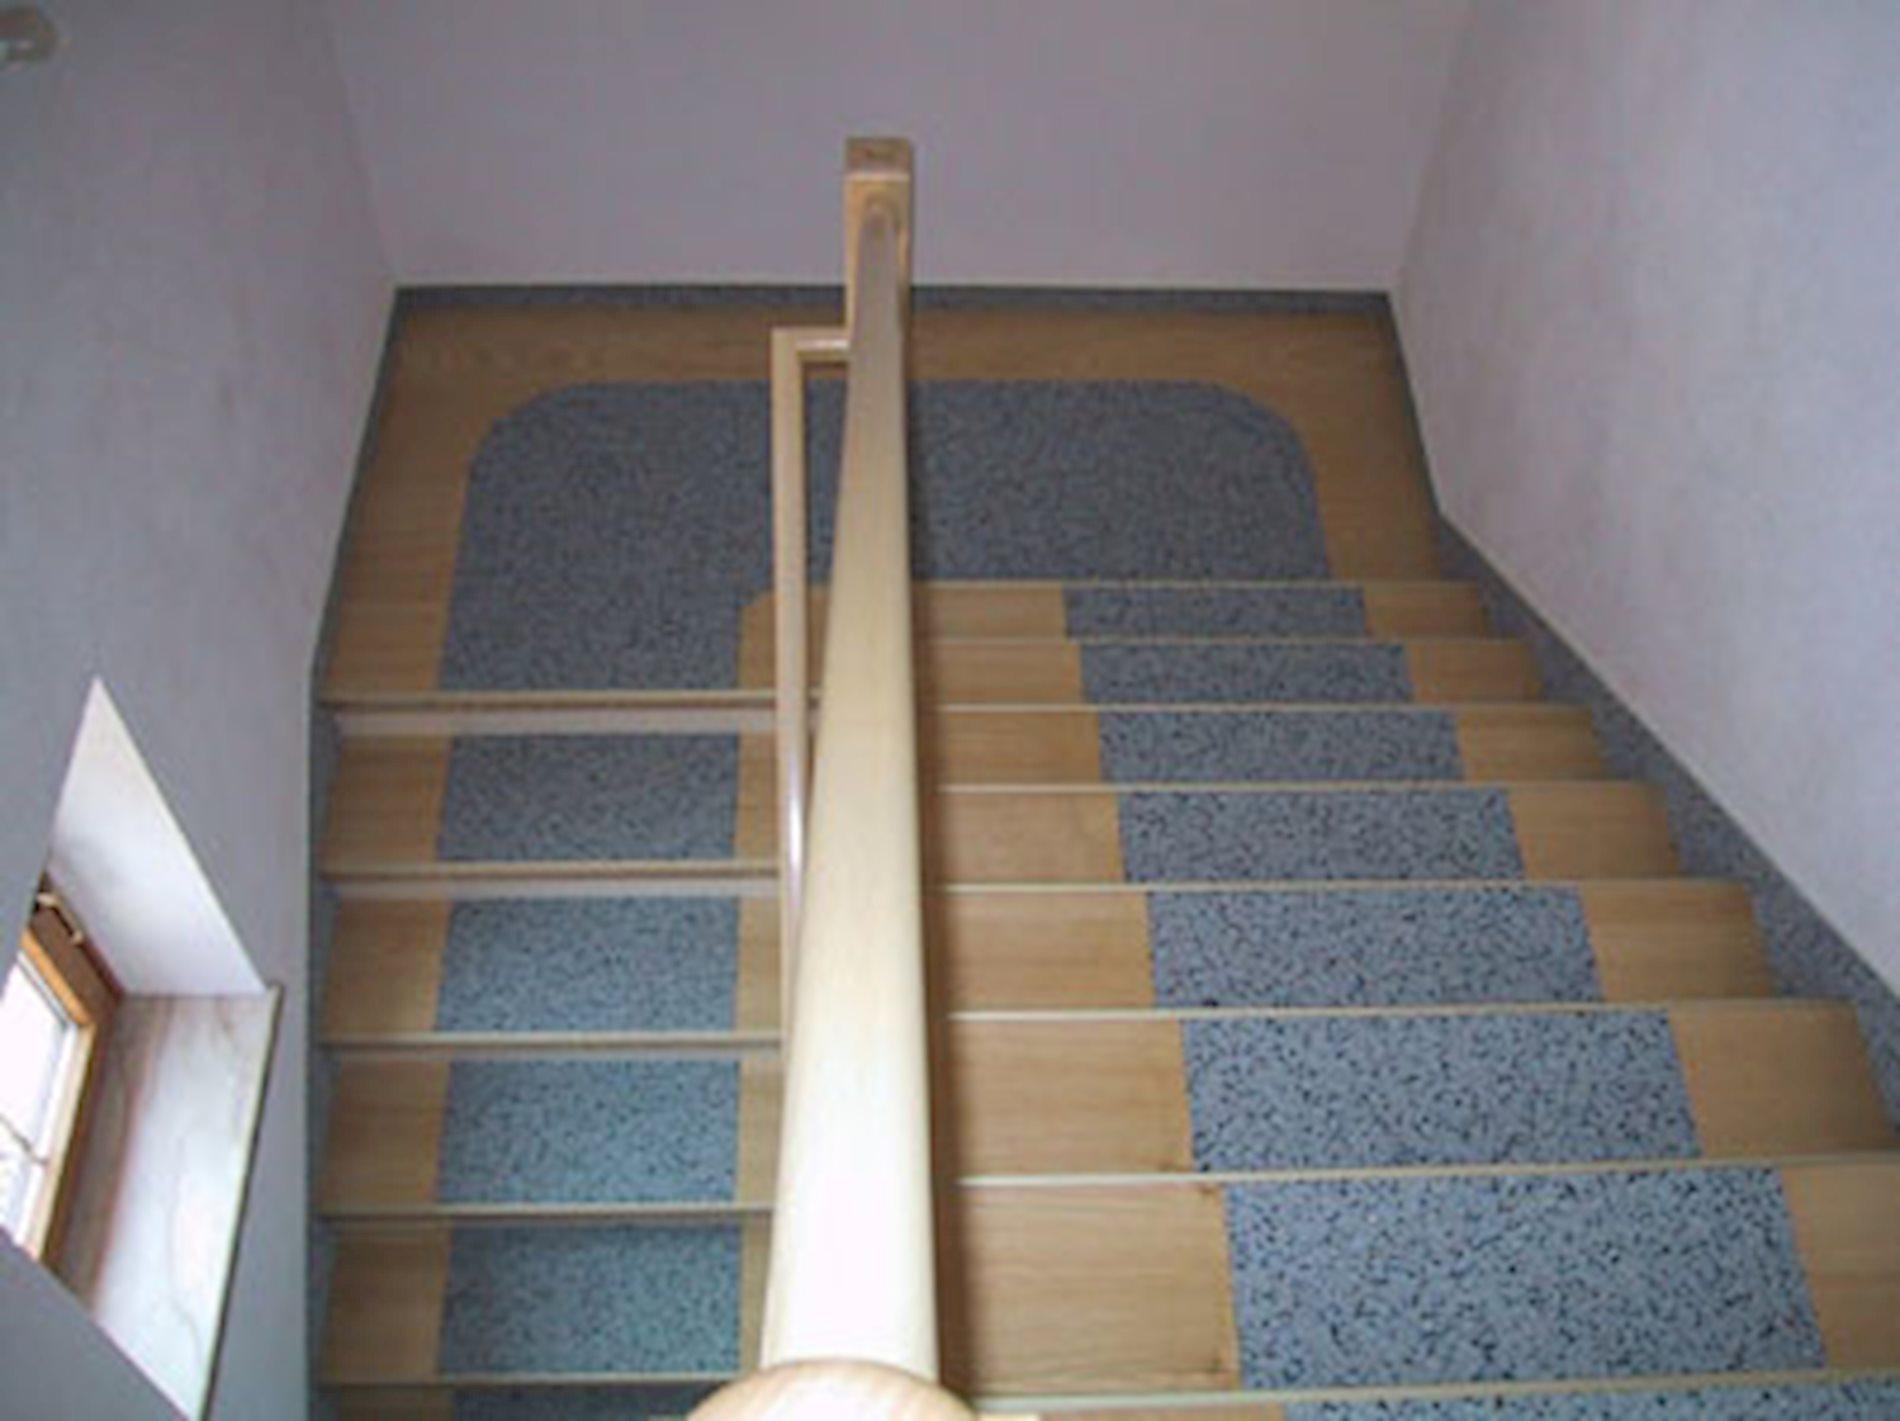 treppenkantenprofile und treppenprofile zur treppenrenovierung mit renoprofil. Black Bedroom Furniture Sets. Home Design Ideas